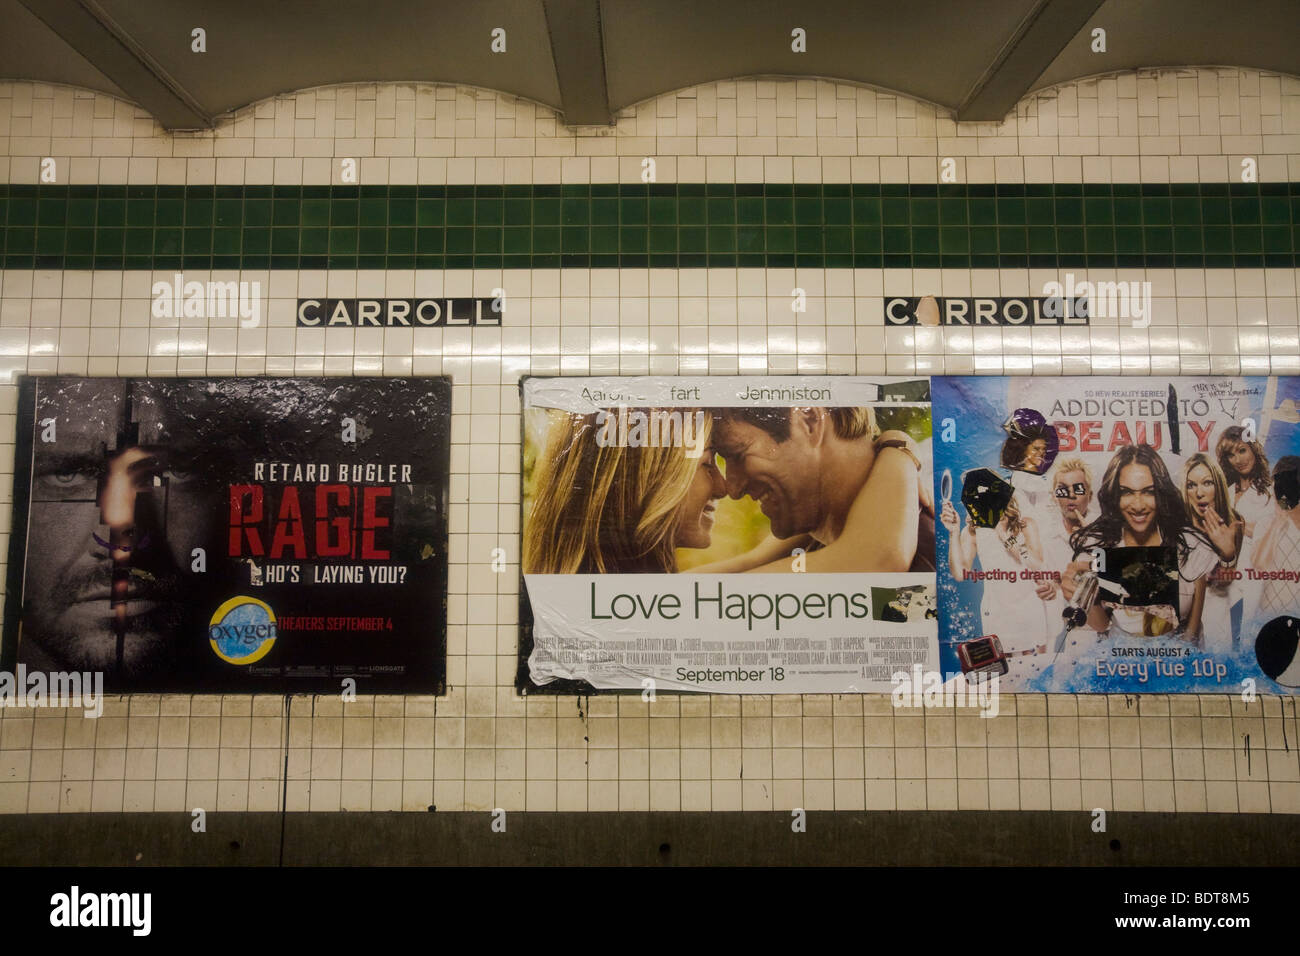 Subway ads, Brooklyn, New York, United States of America - Stock Image